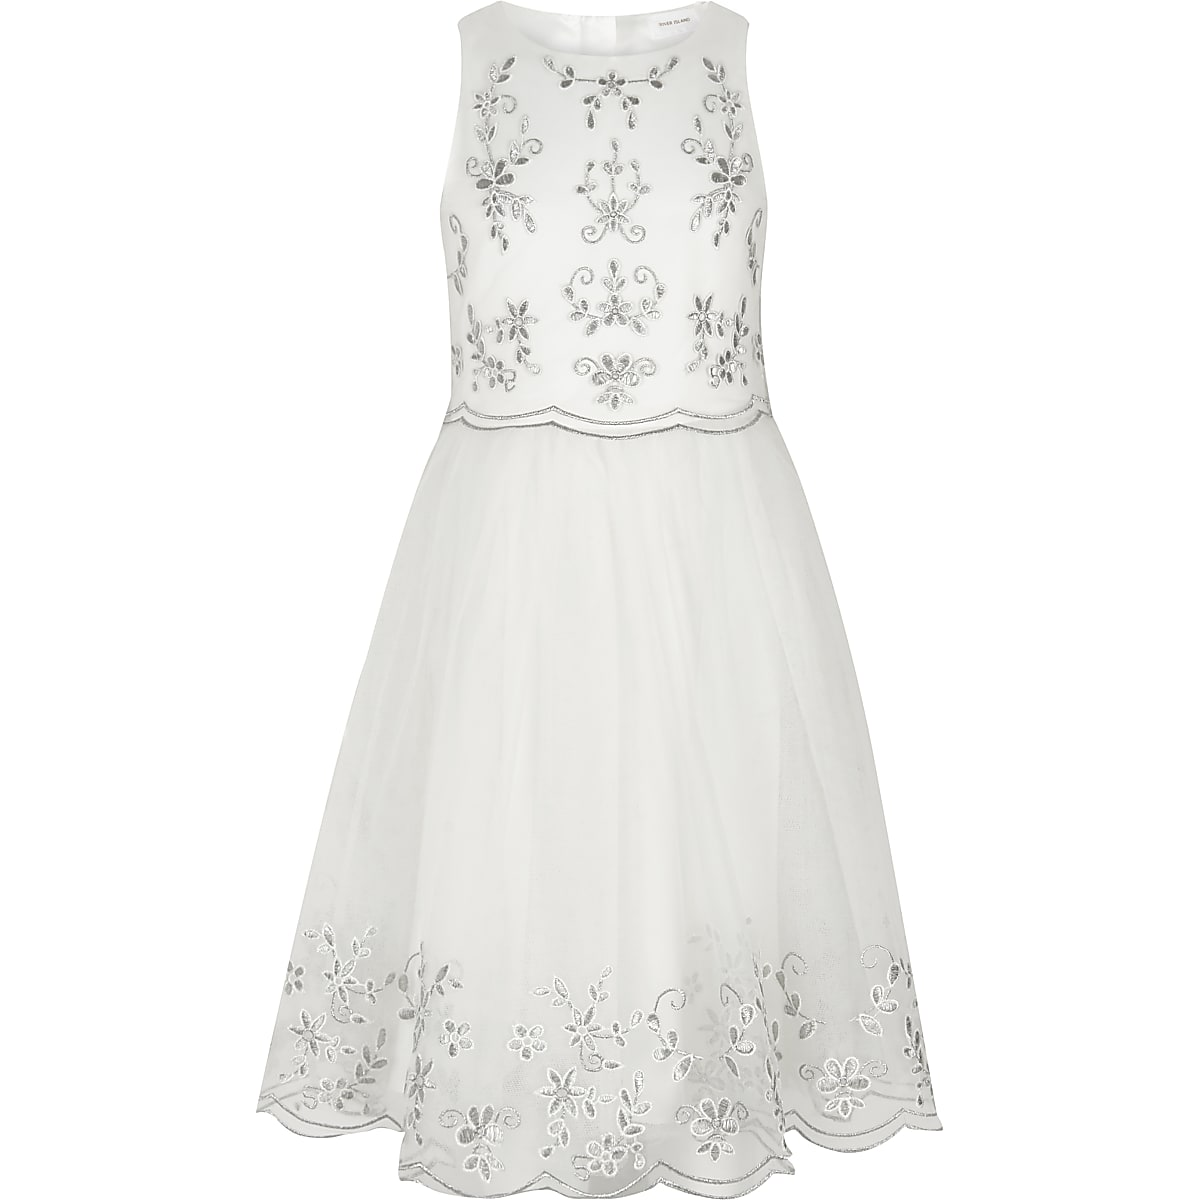 Witte geborduurde bruidsmeisjesjurk voor meisjes